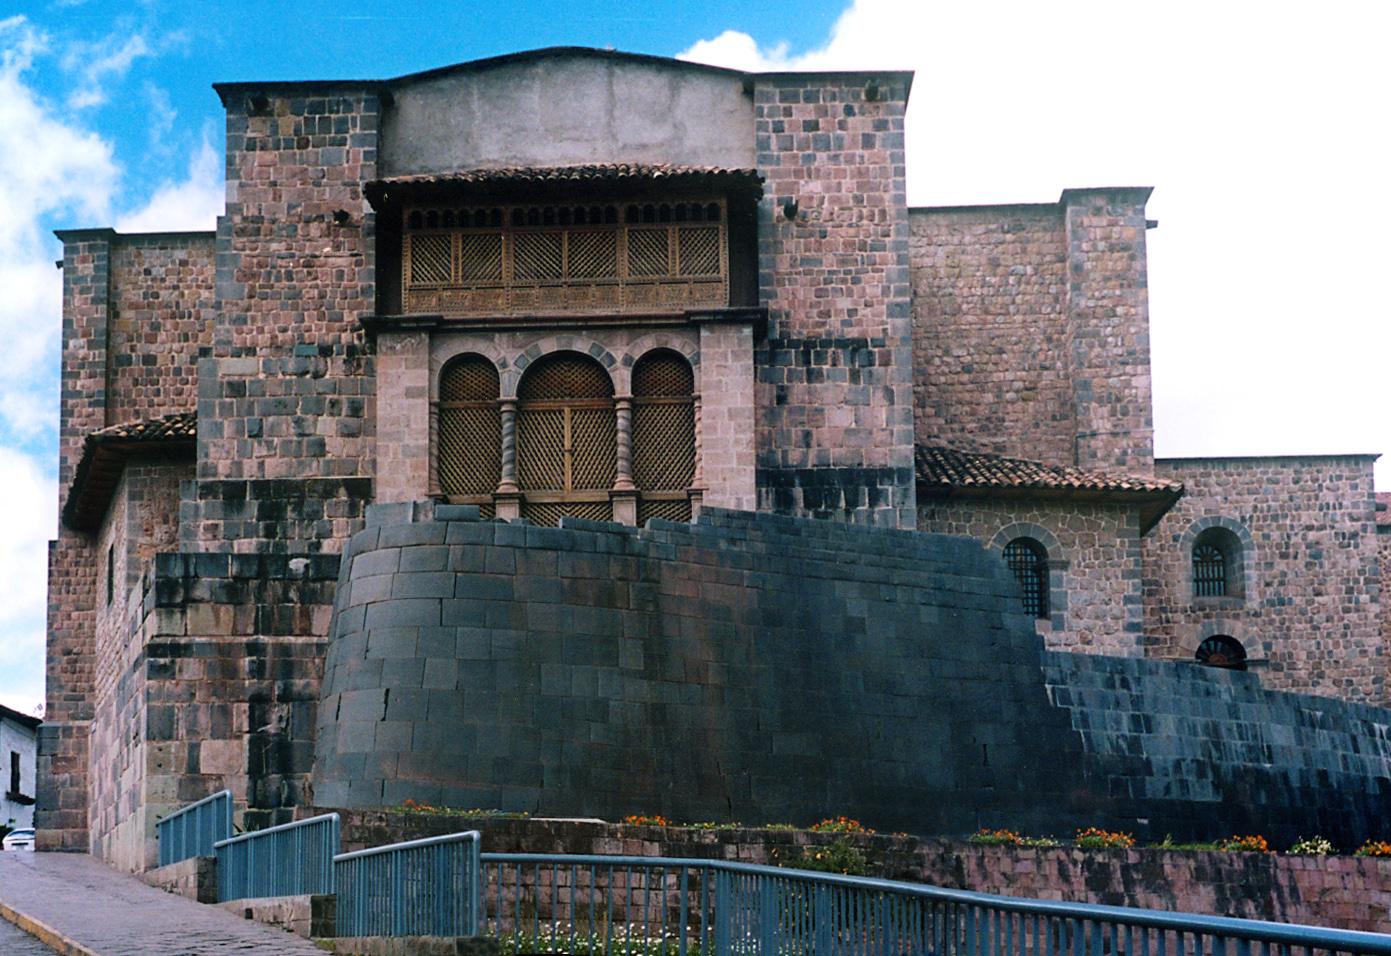 Iglesia de Santo Domingo y Qorikancha, Cusco, Perú (foto: Håkan Svensson, CC BY-SA 3.0)